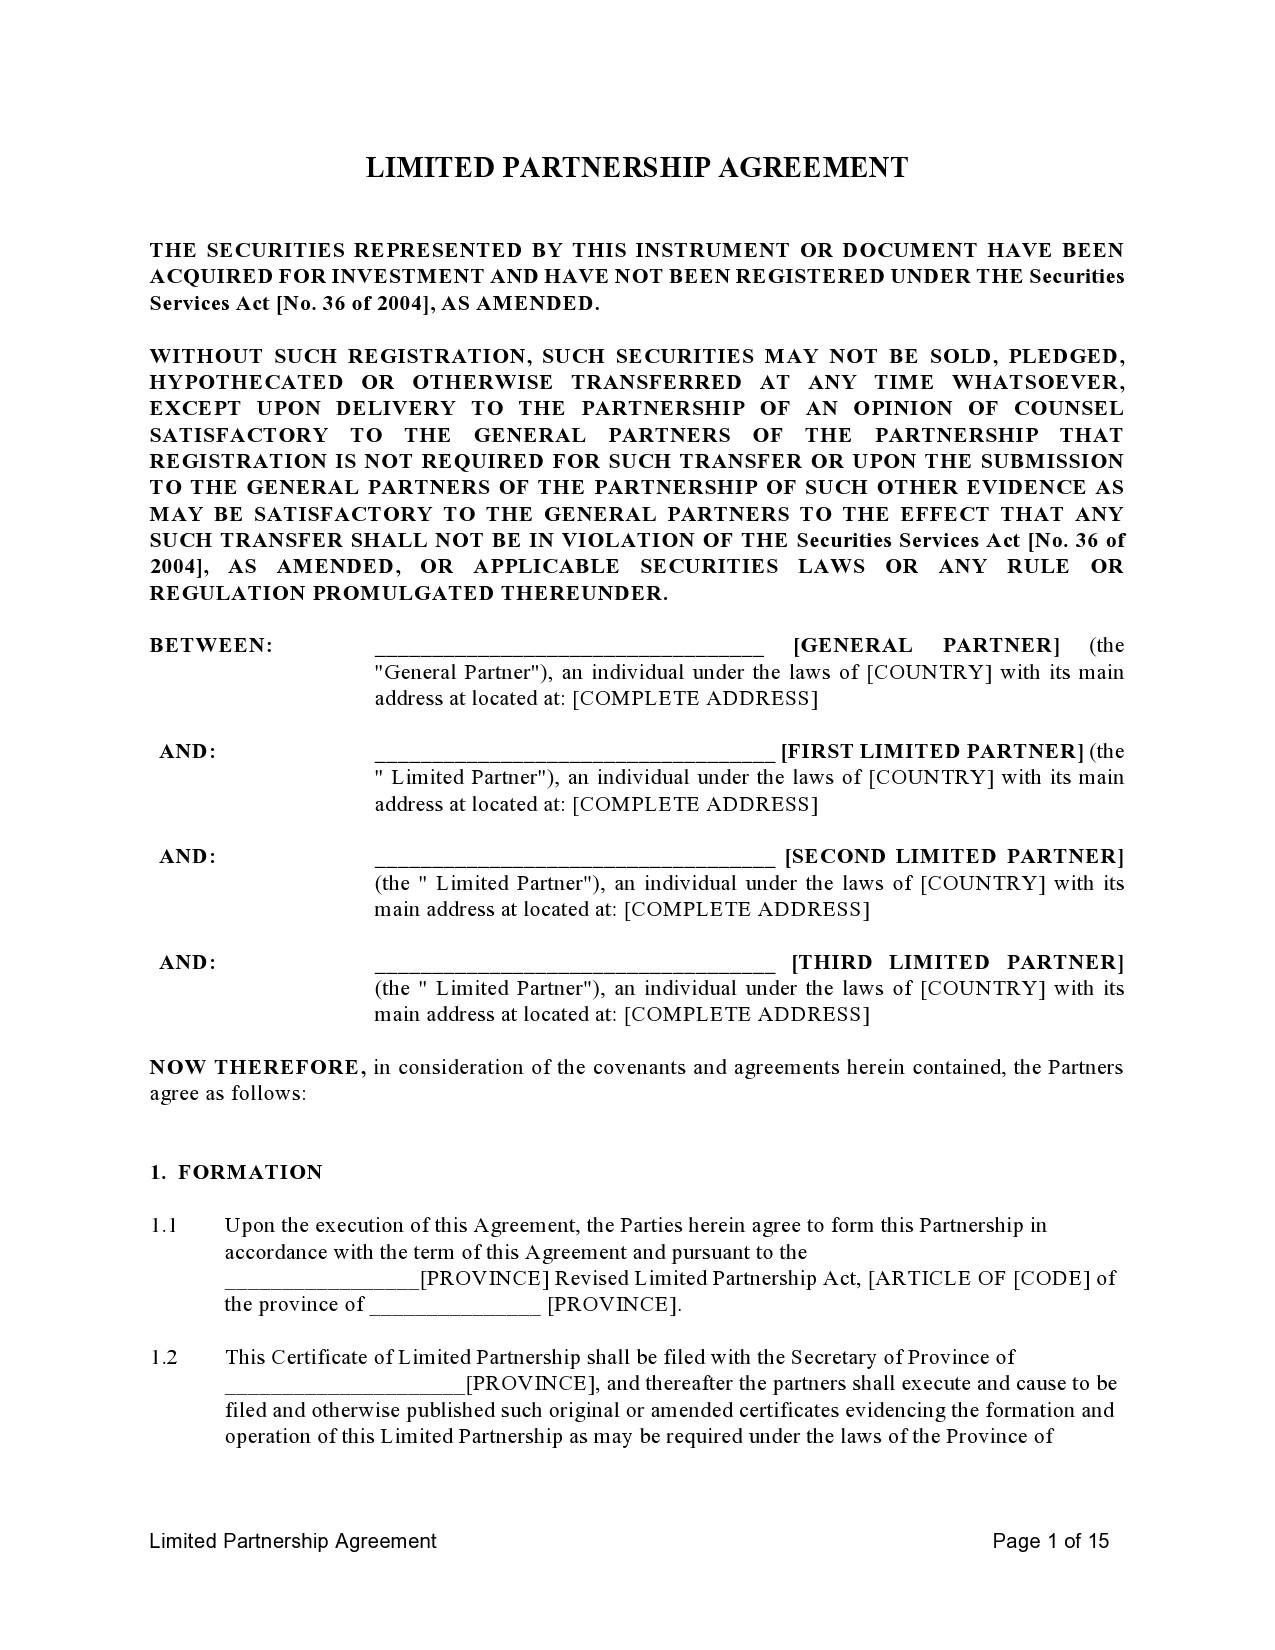 Free limited partnership agreement 16